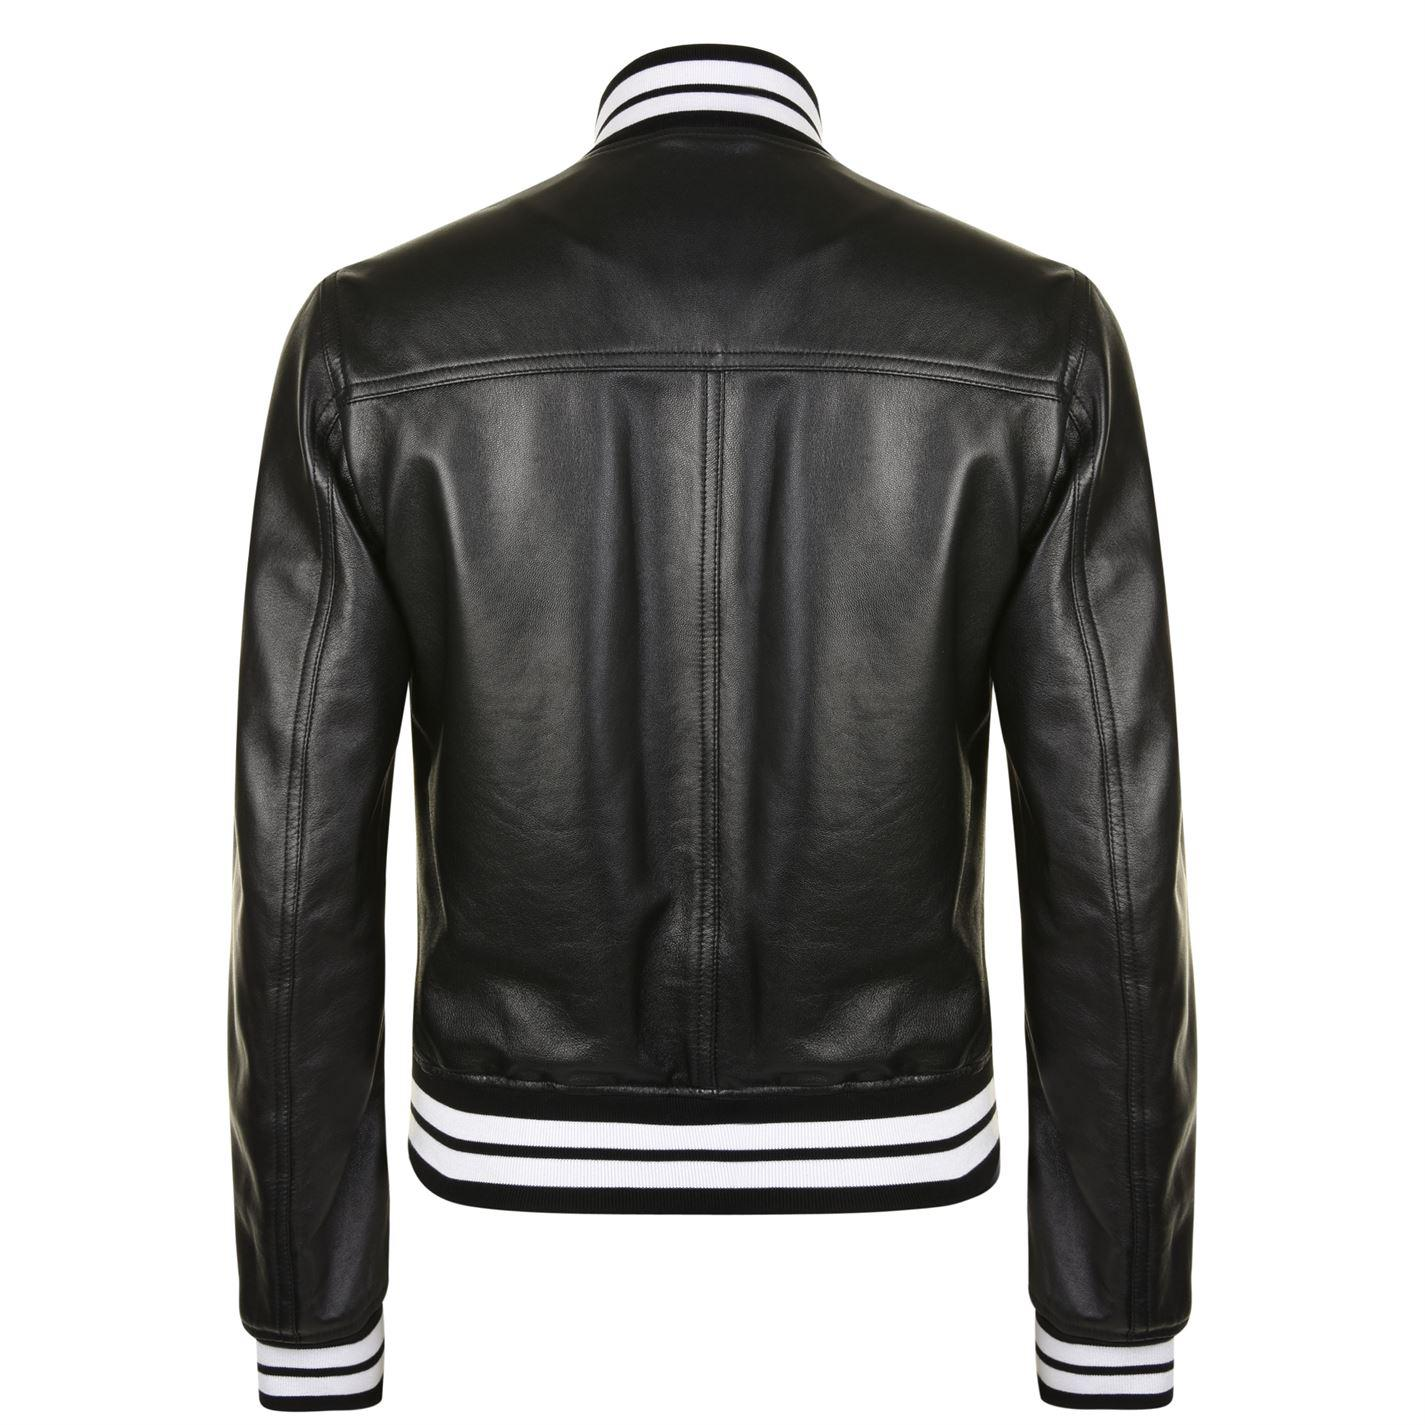 Dolce & Gabbana King Ace Leather Bomber Jacket in Black for Men